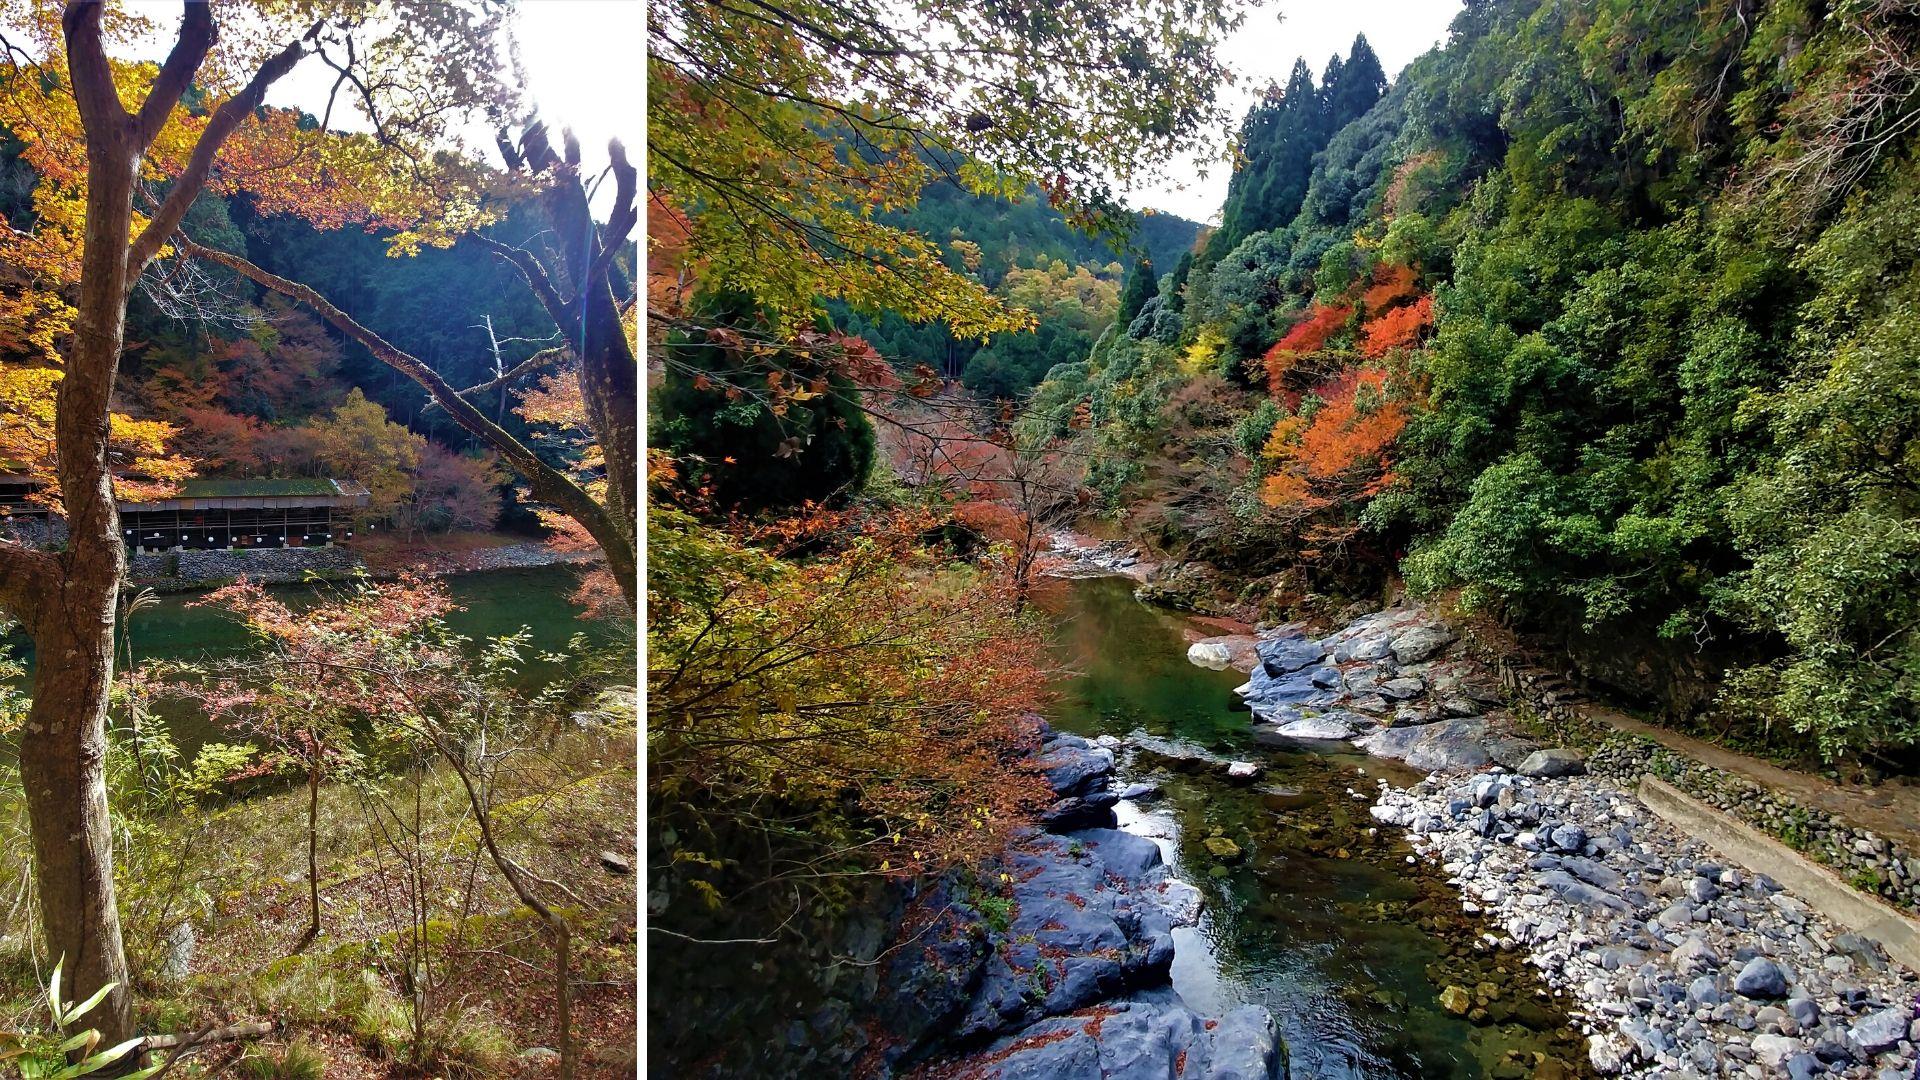 kyoto togano takao randonnee blog voyage japon arpenter le chemin